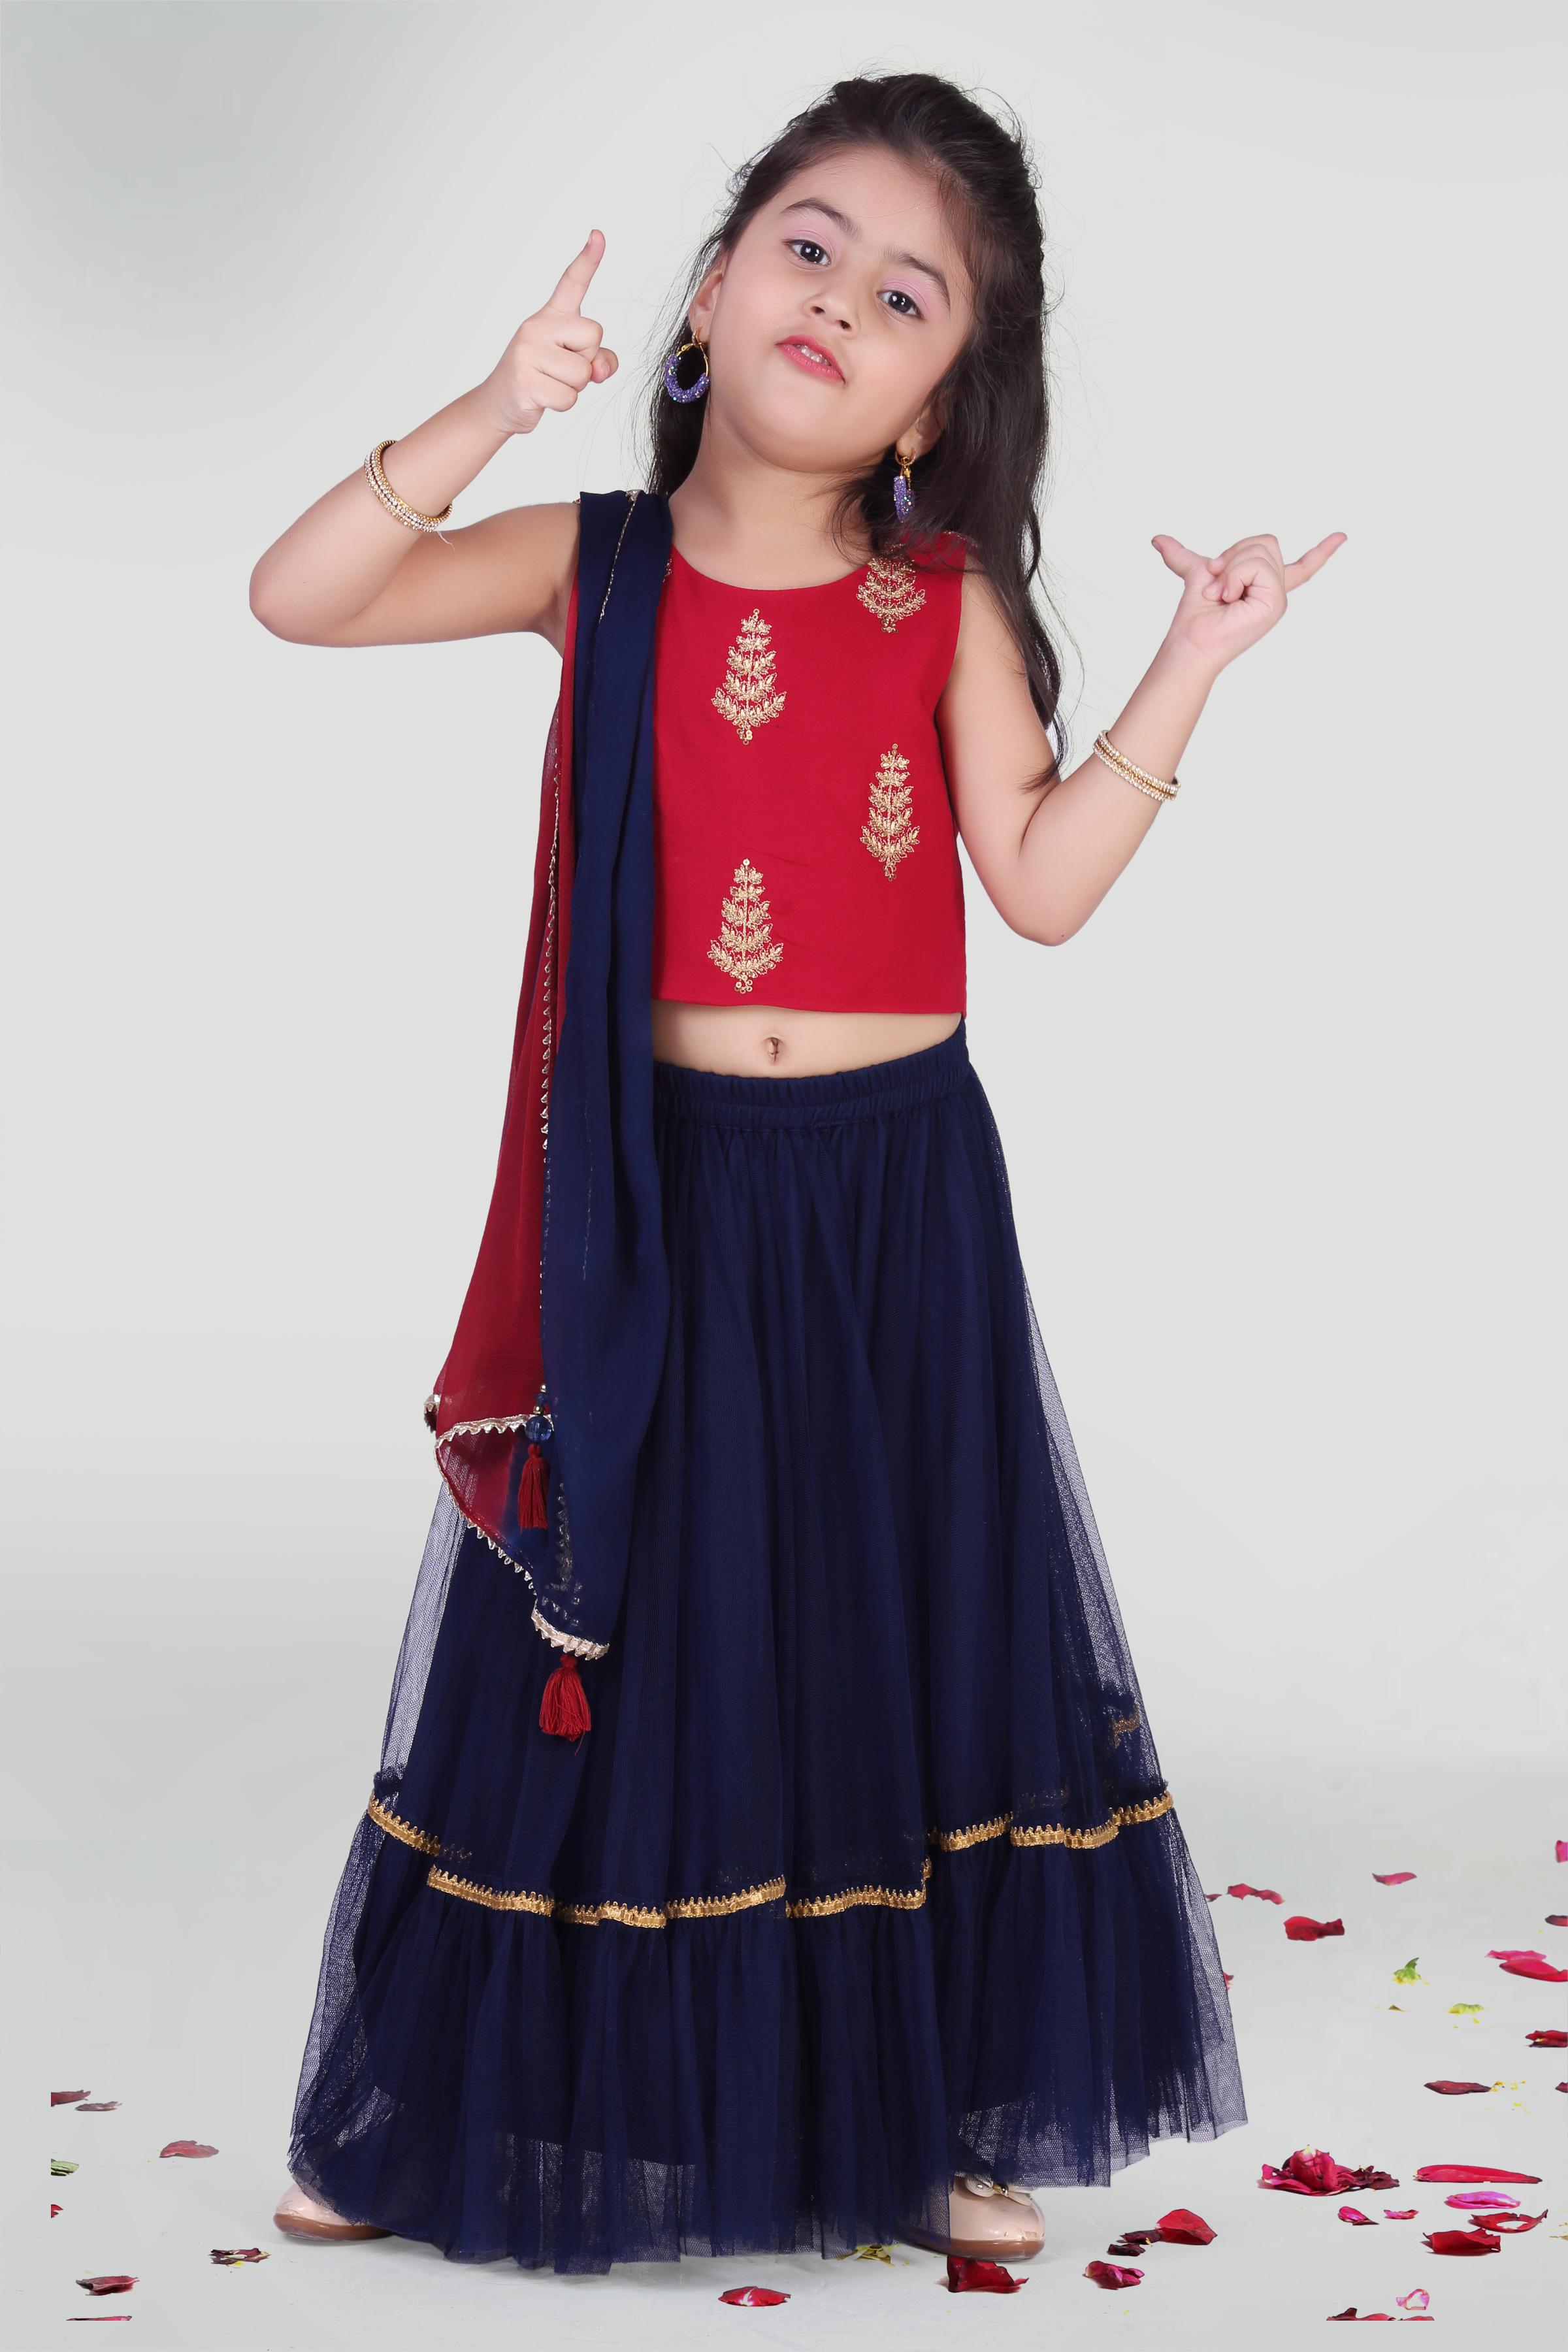 MINI CHIC   Skirt and Choli Set for Girls with Dupatta